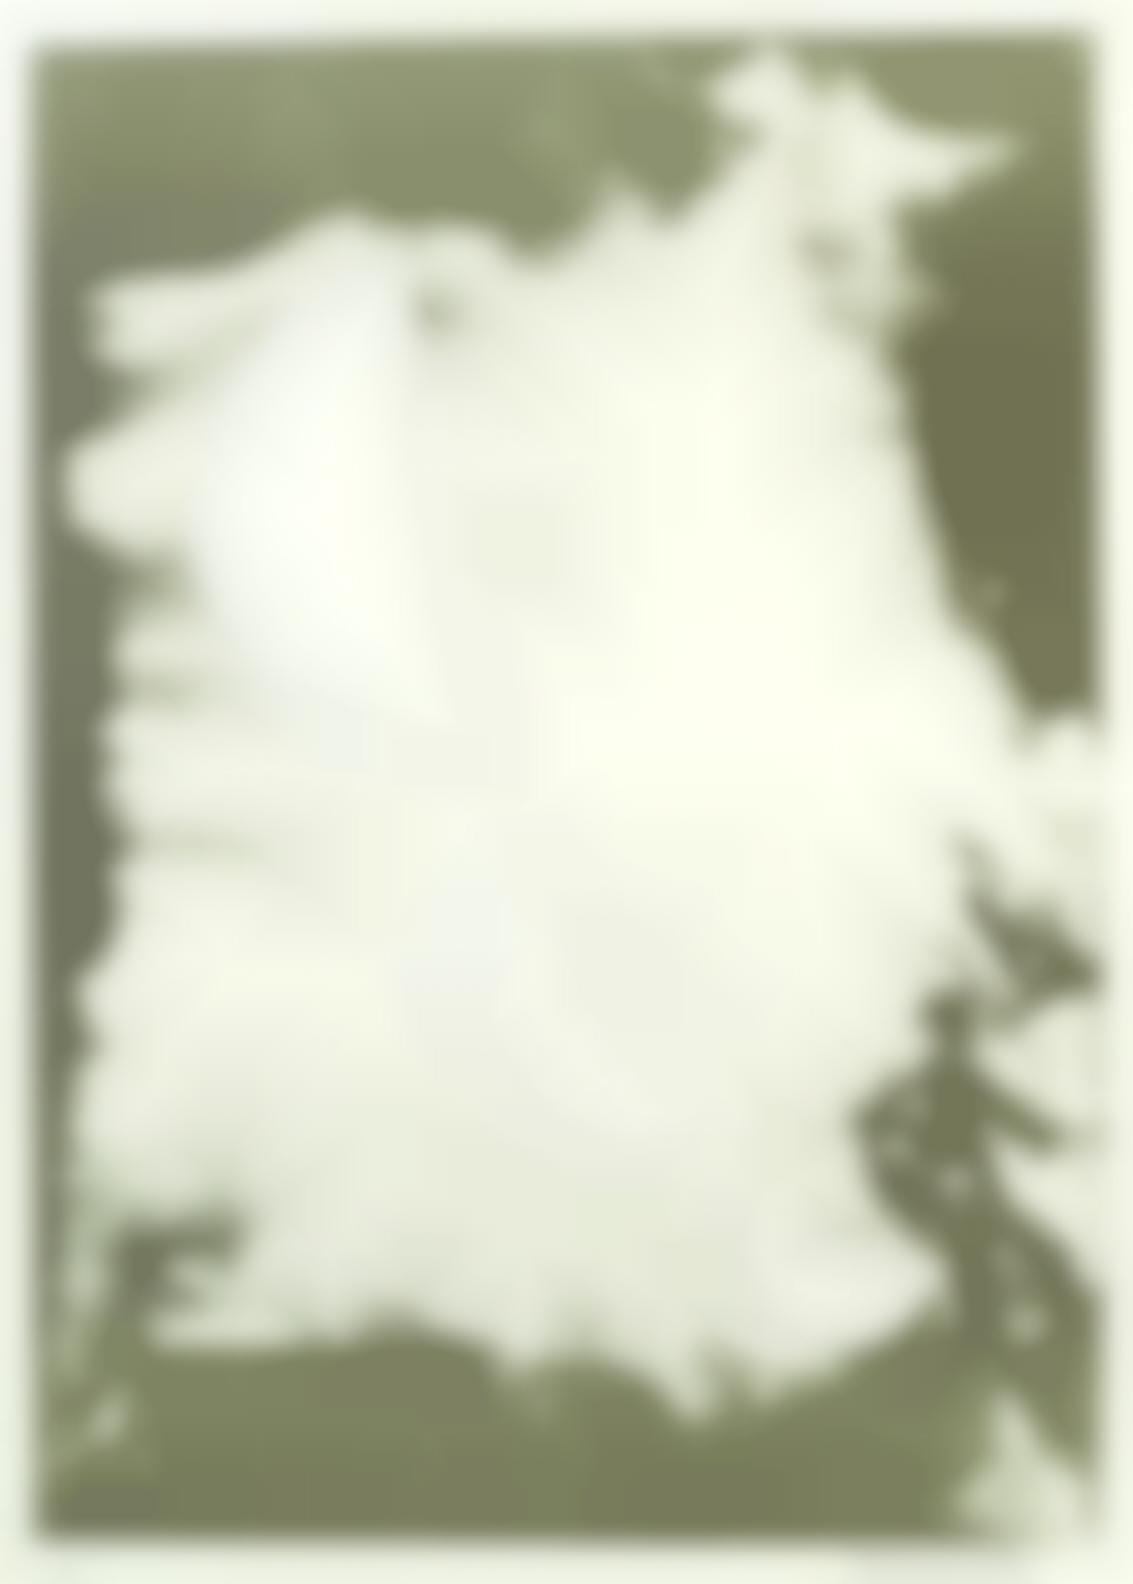 Barbara Hepworth-Desert Forms, From Aegean Suite-1971